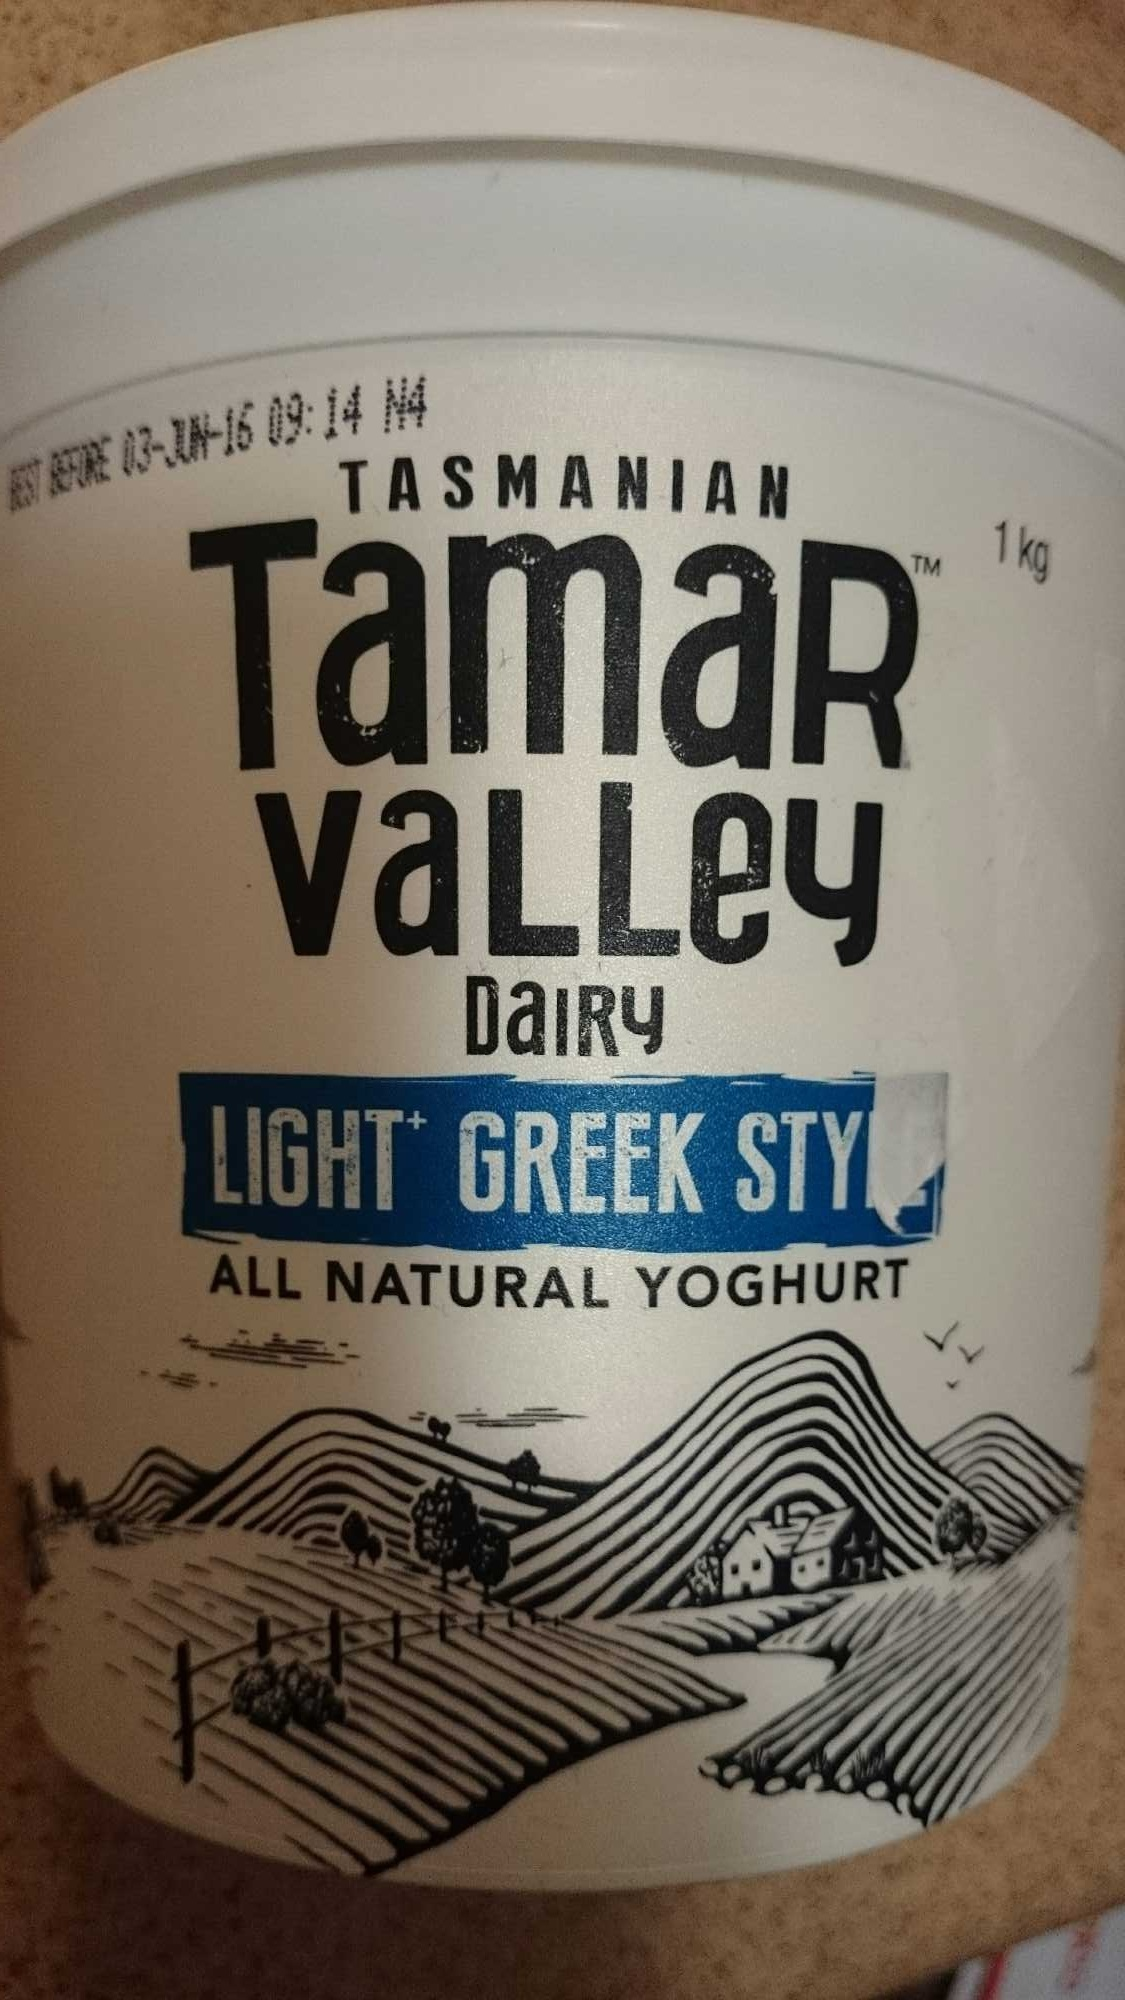 Light Greek Style All Natural Yoghurt - Product - en